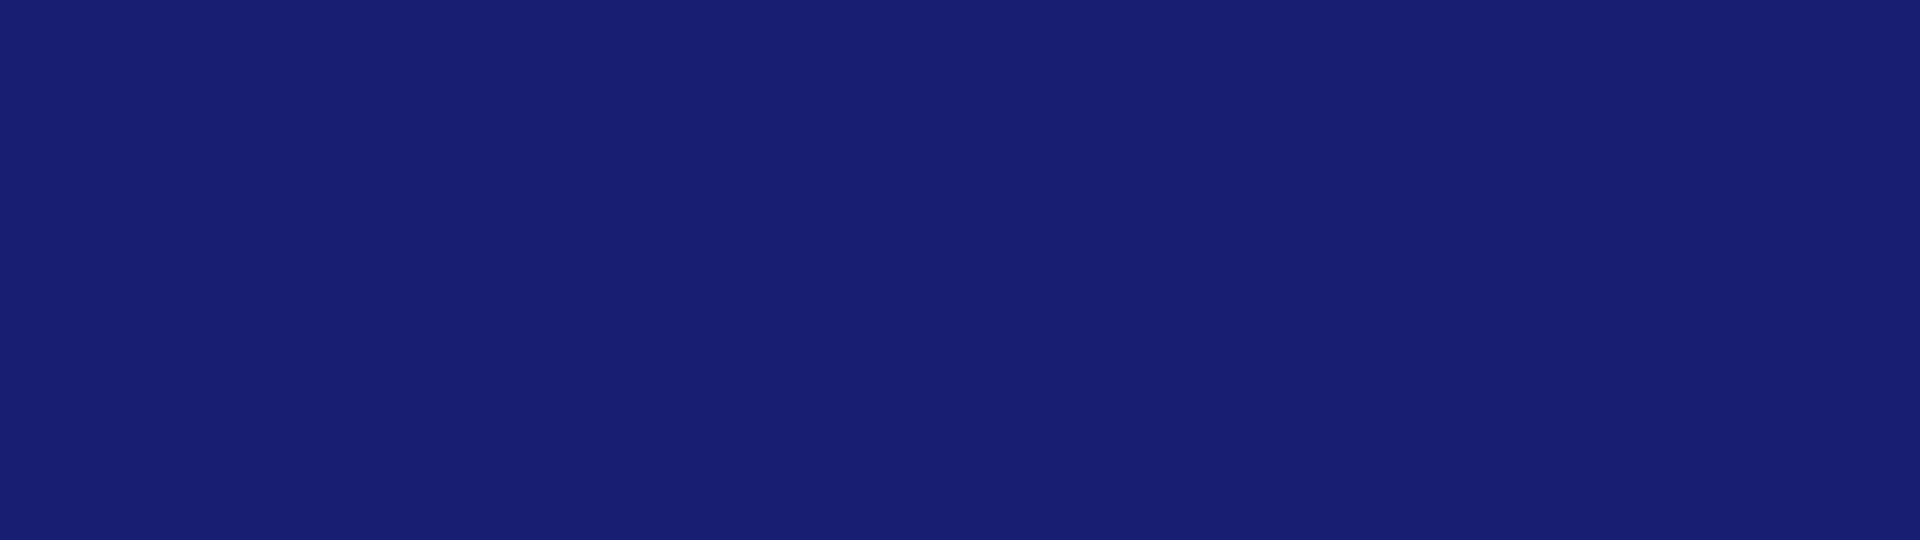 MARKETING-VISA-KAYDET50TLINDIRIMKAZAN-01-01